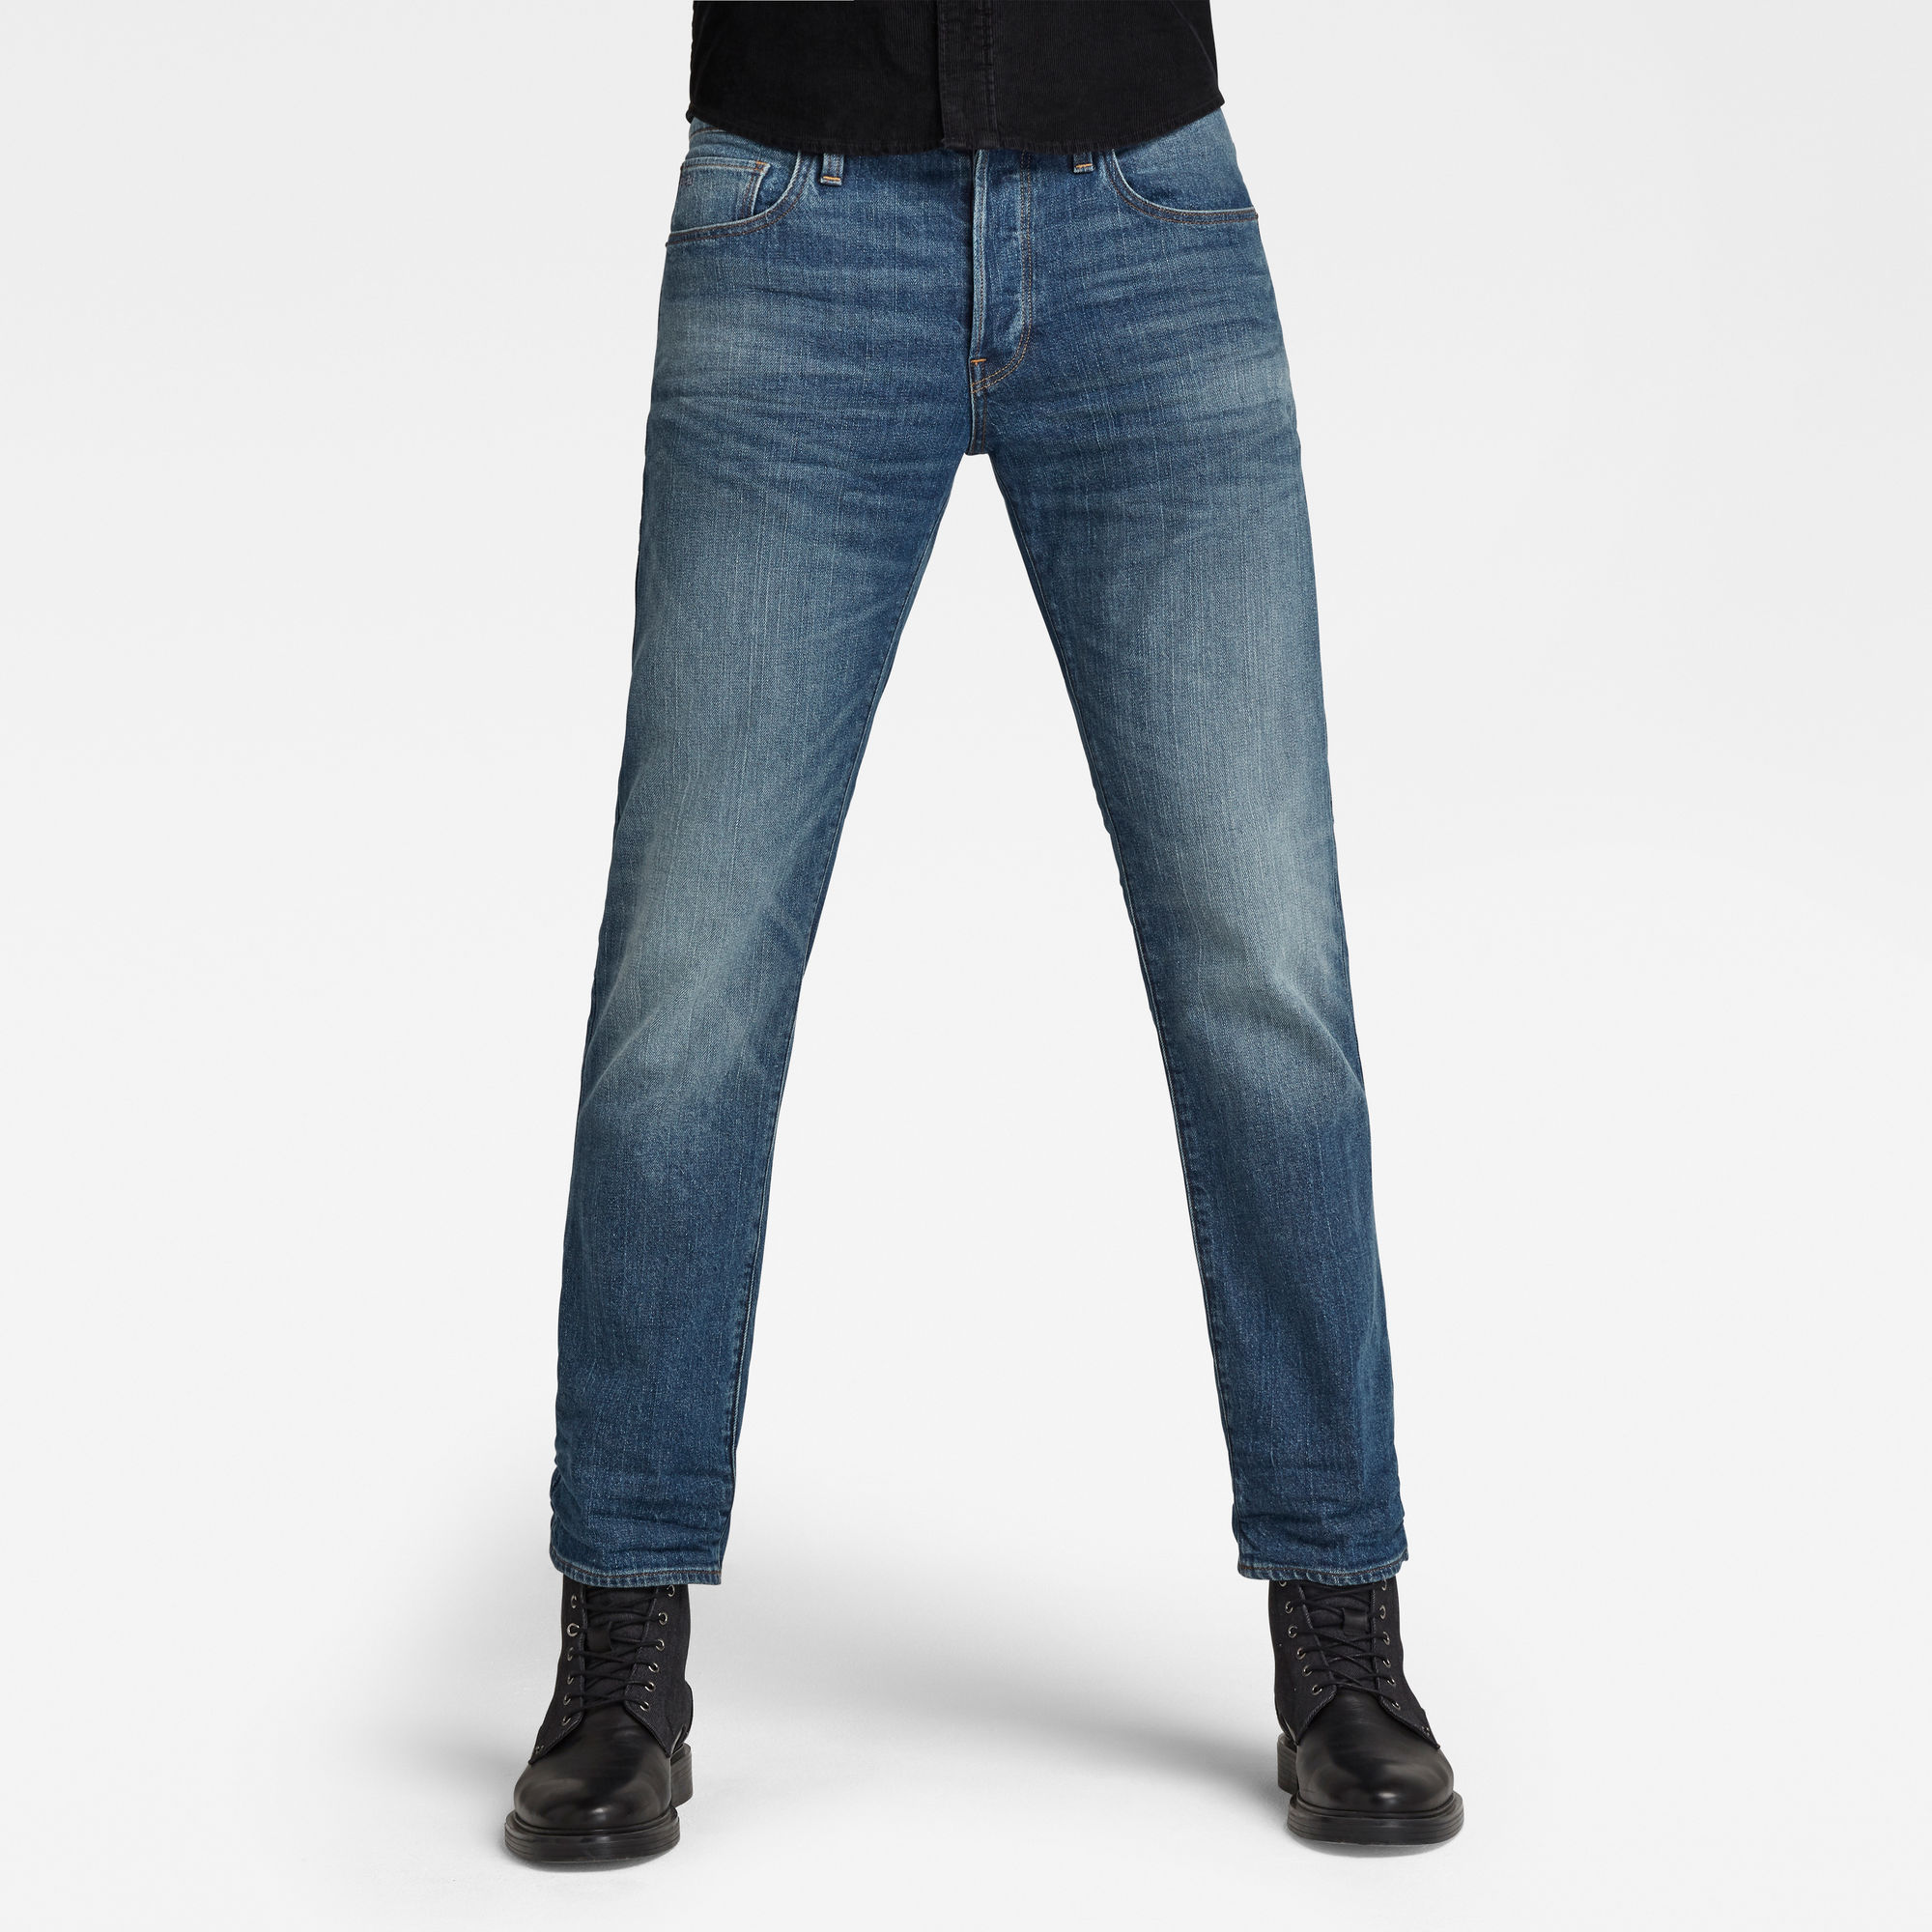 G-Star RAW Heren 3301 Straight Jeans Blauw